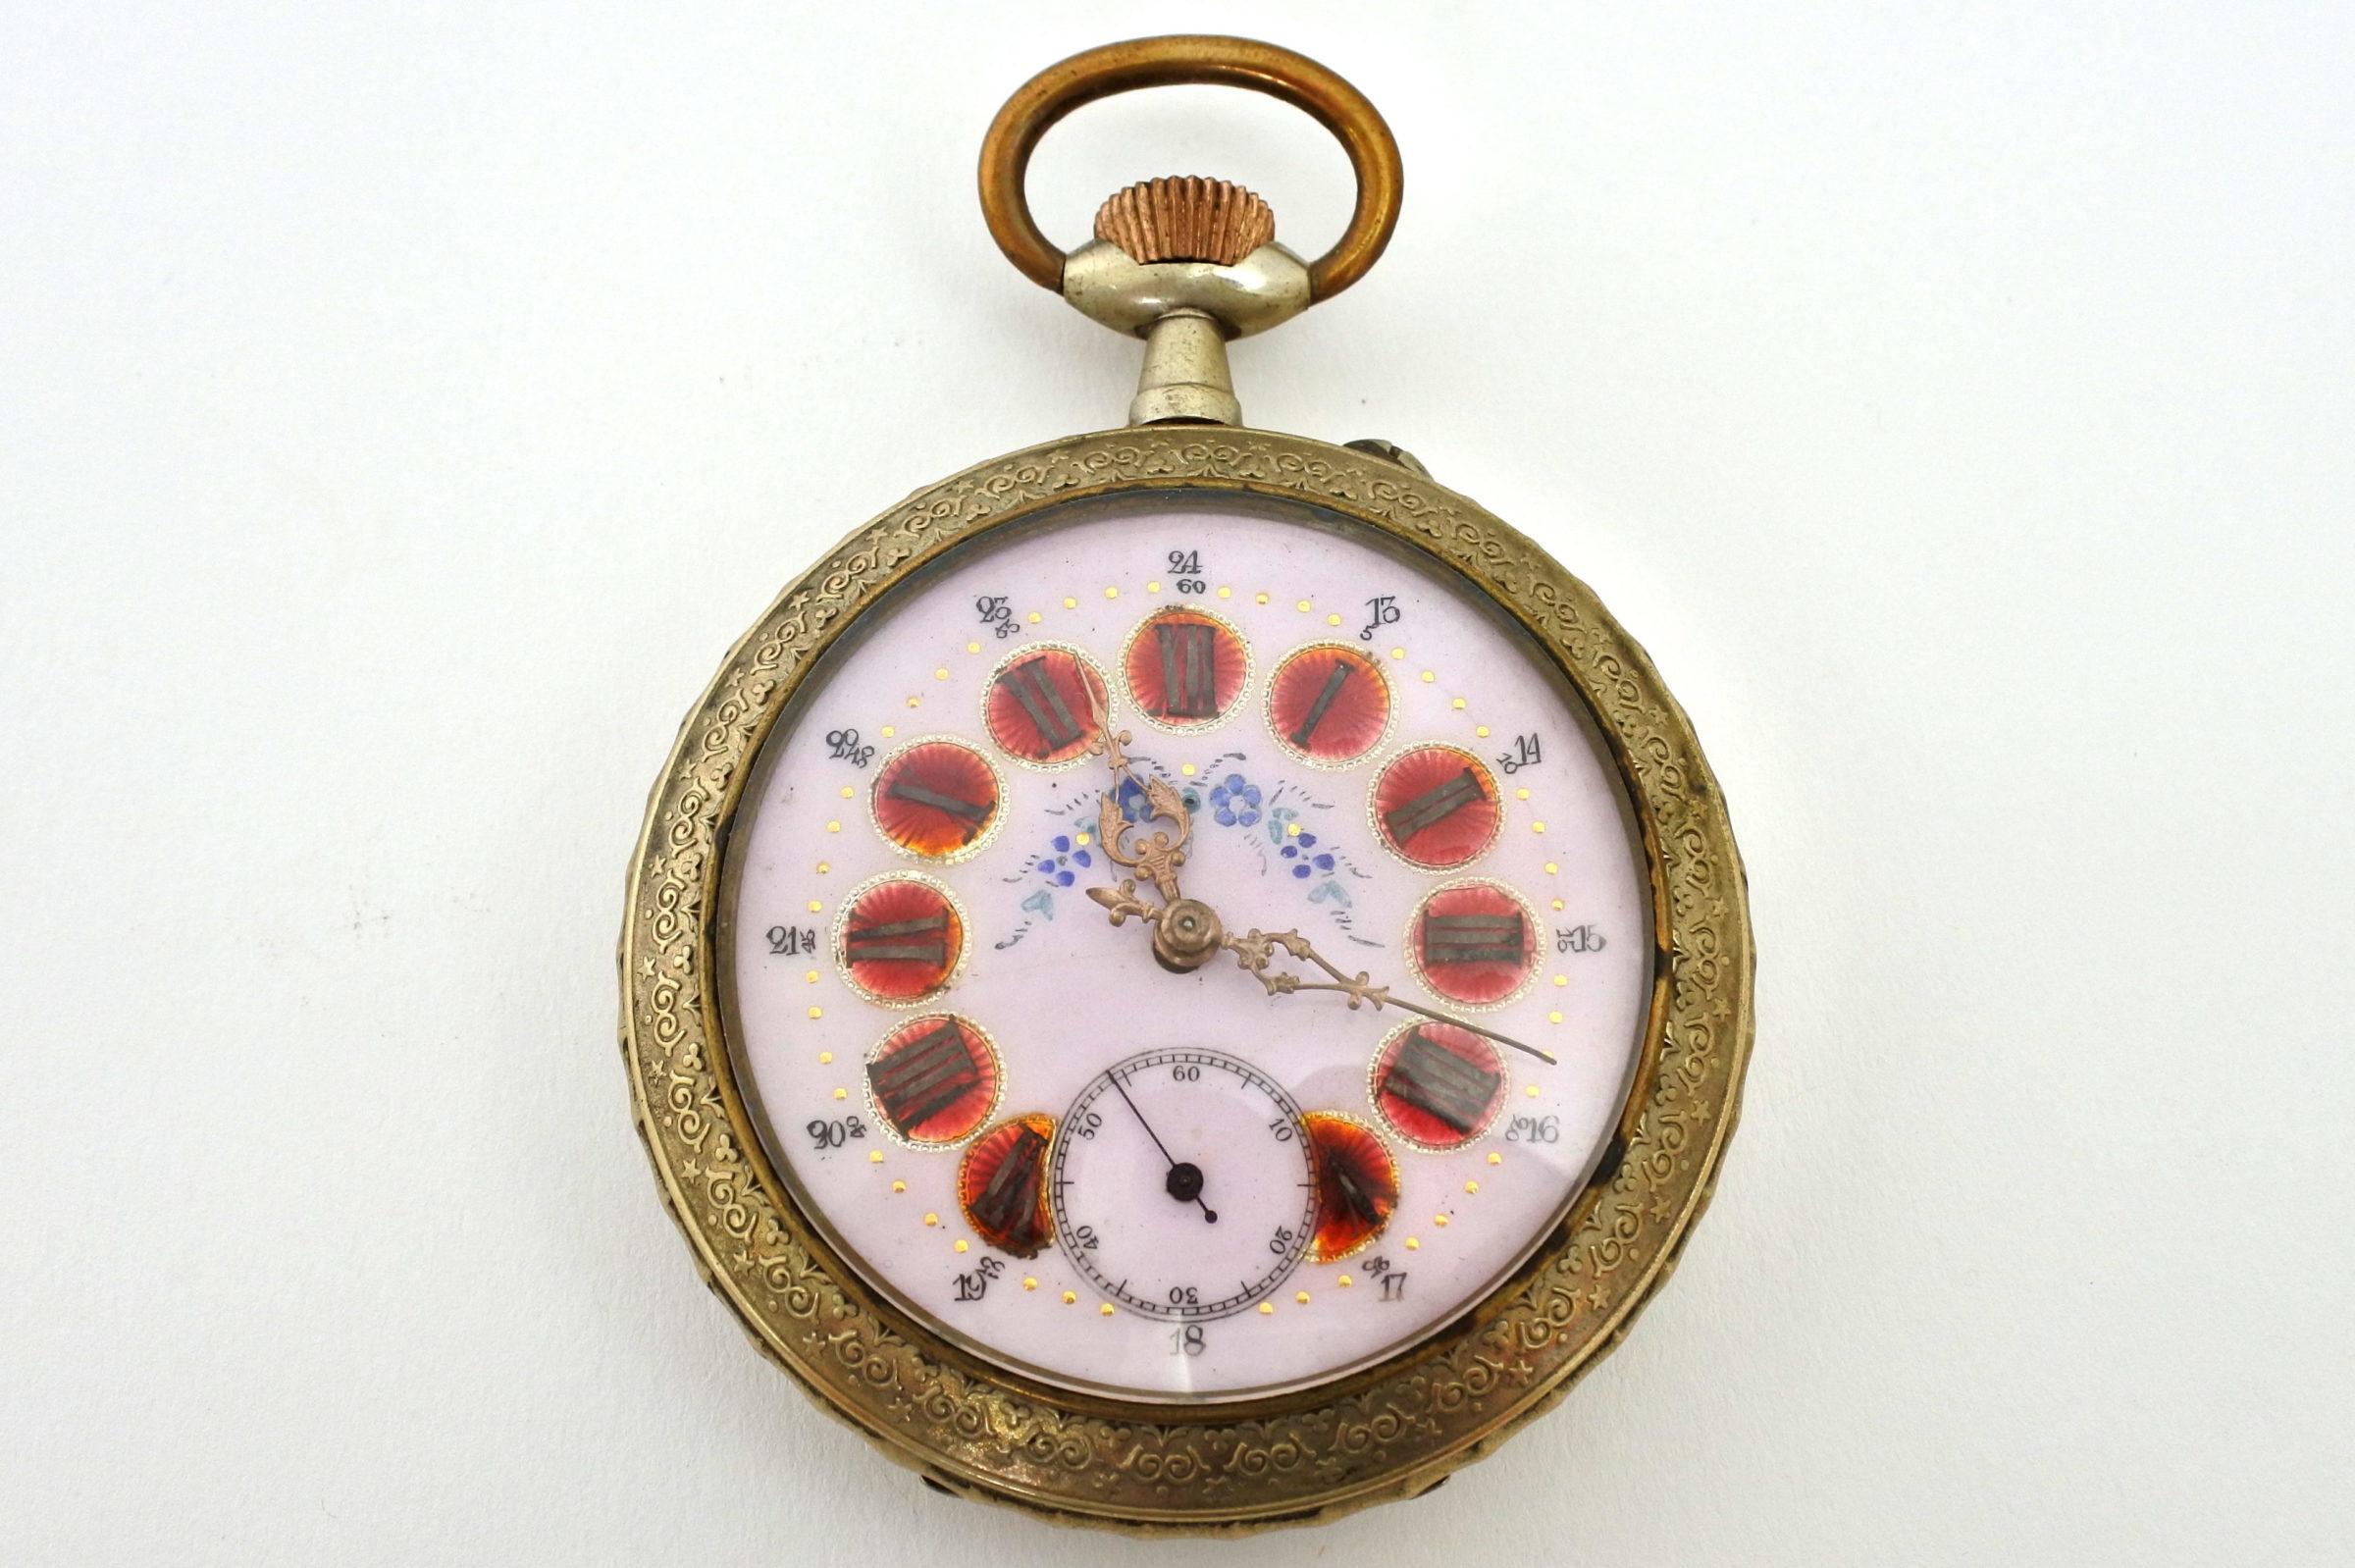 Bellissimo orologio da tasca in argento